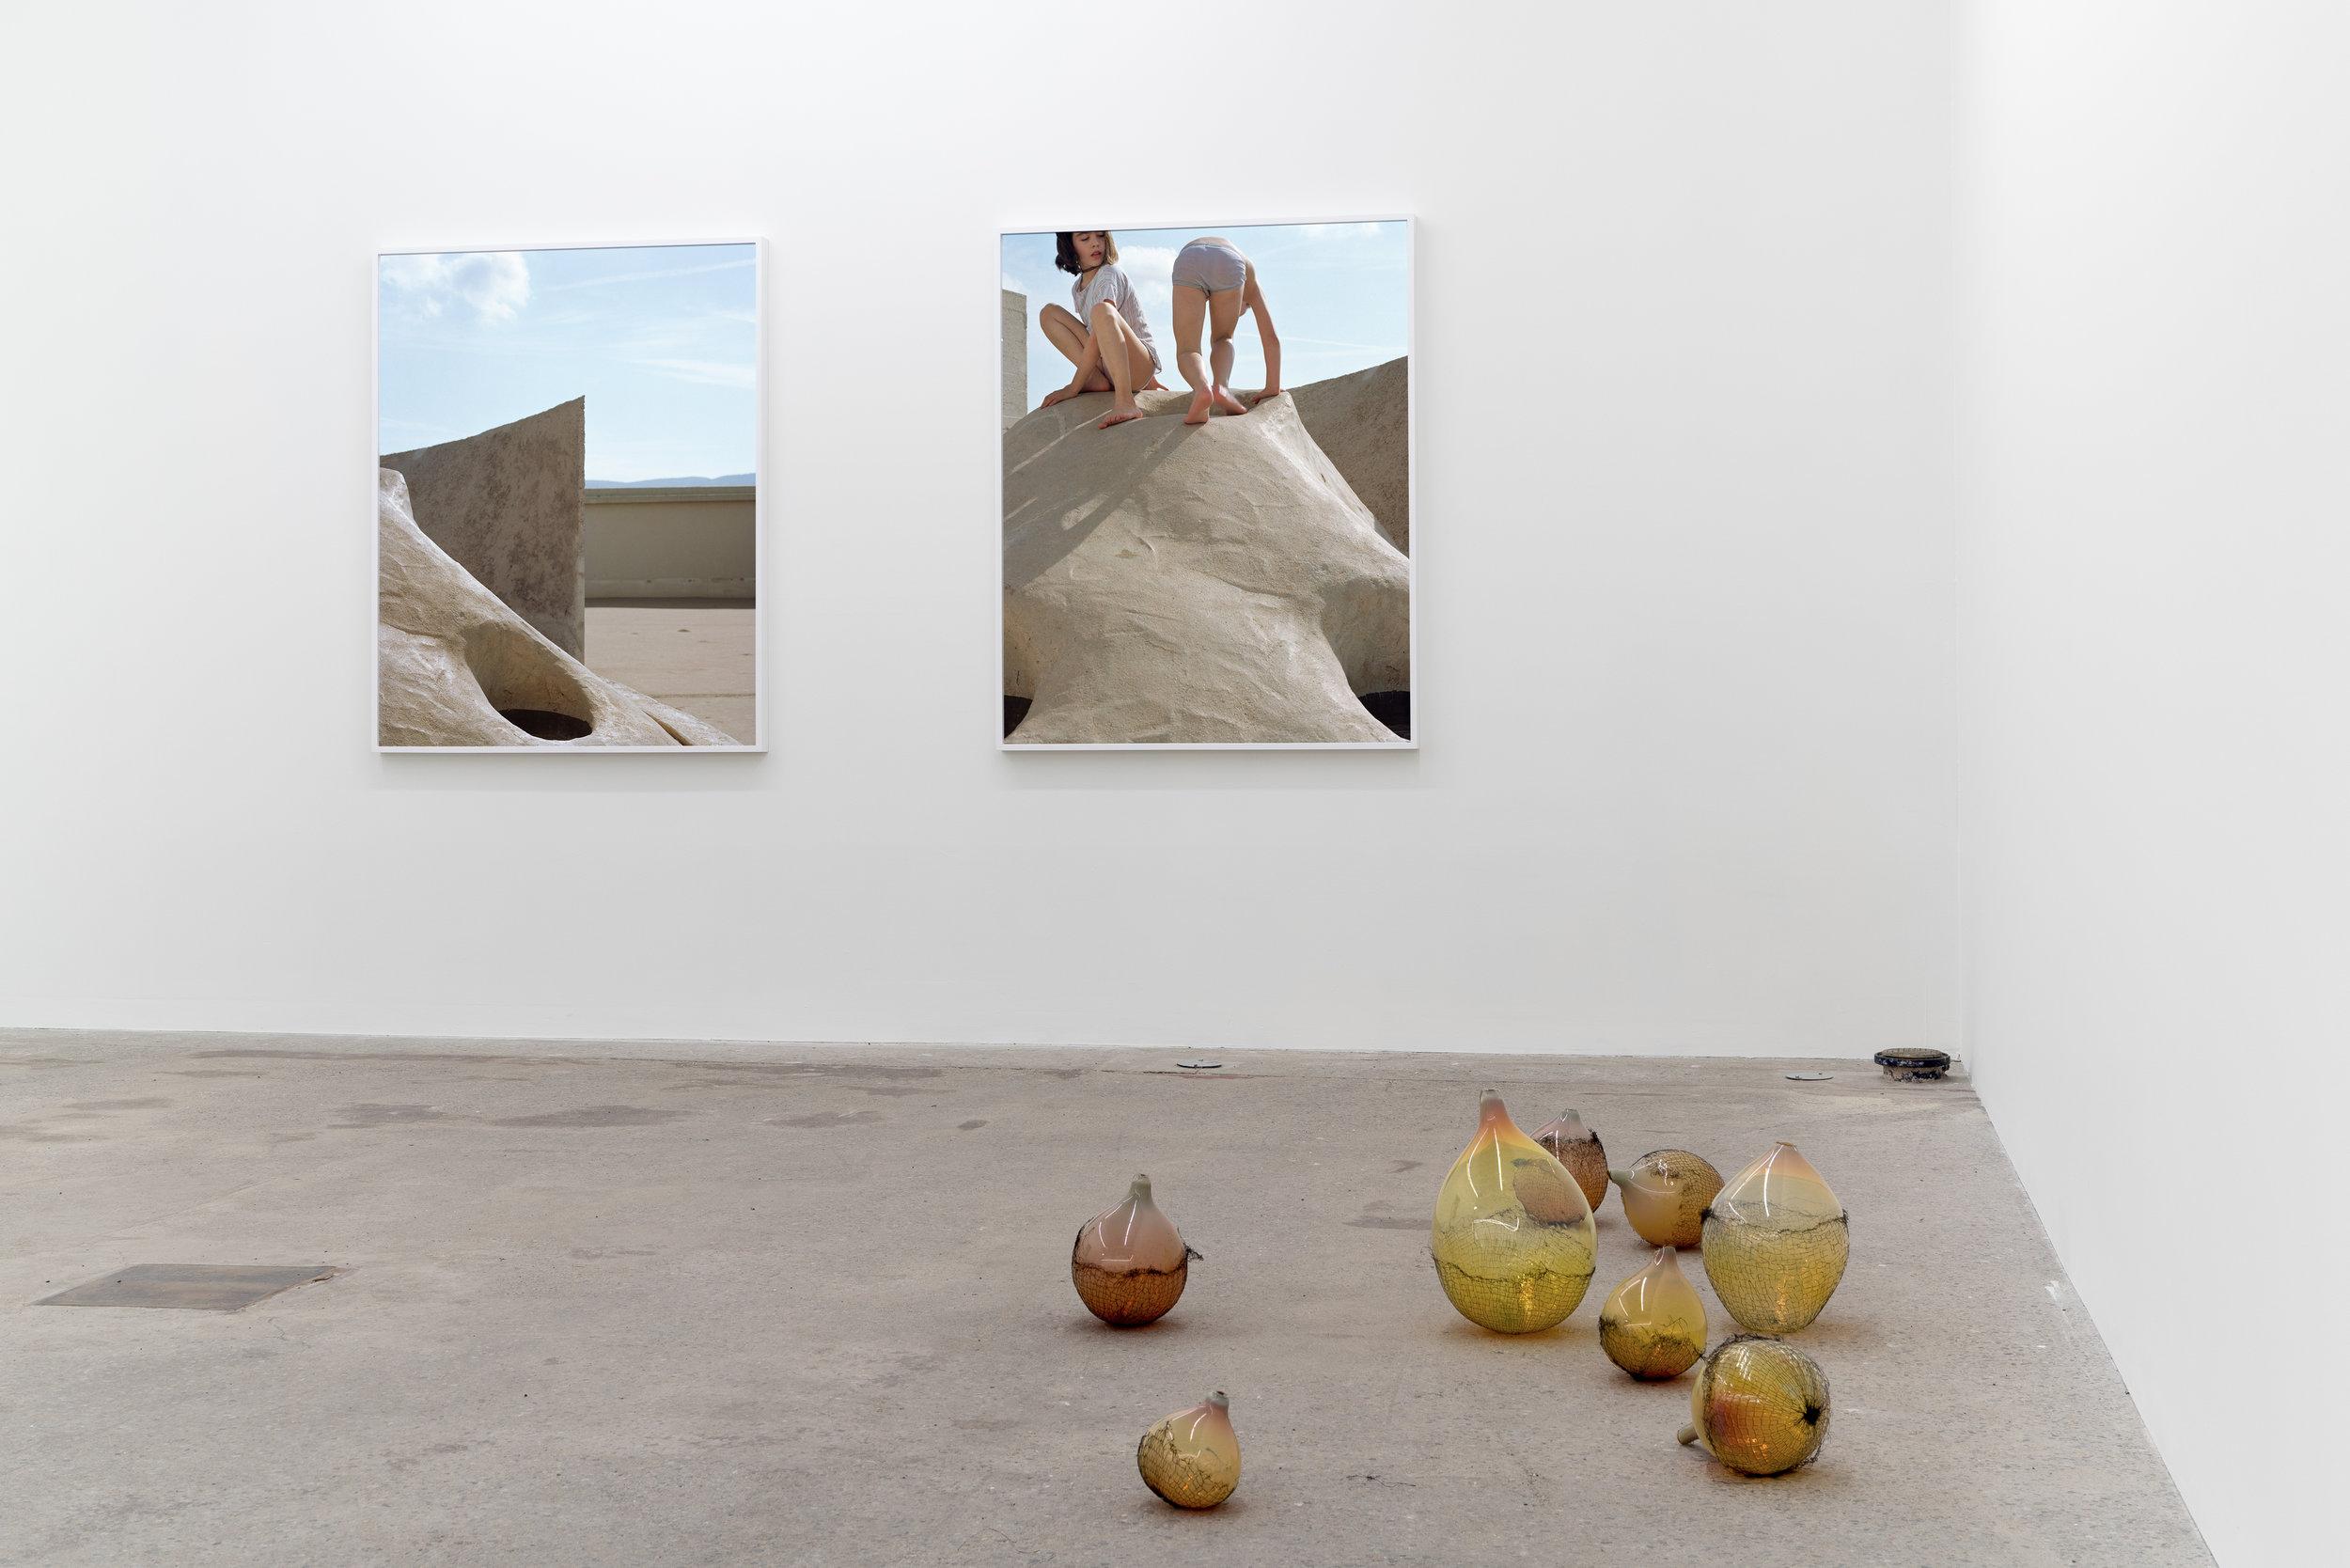 Lorna Bauer,  Tools for Idlers , 2018, exhibition view, Galerie Nicolas Robert, photo : Jean-Michael Seminaro